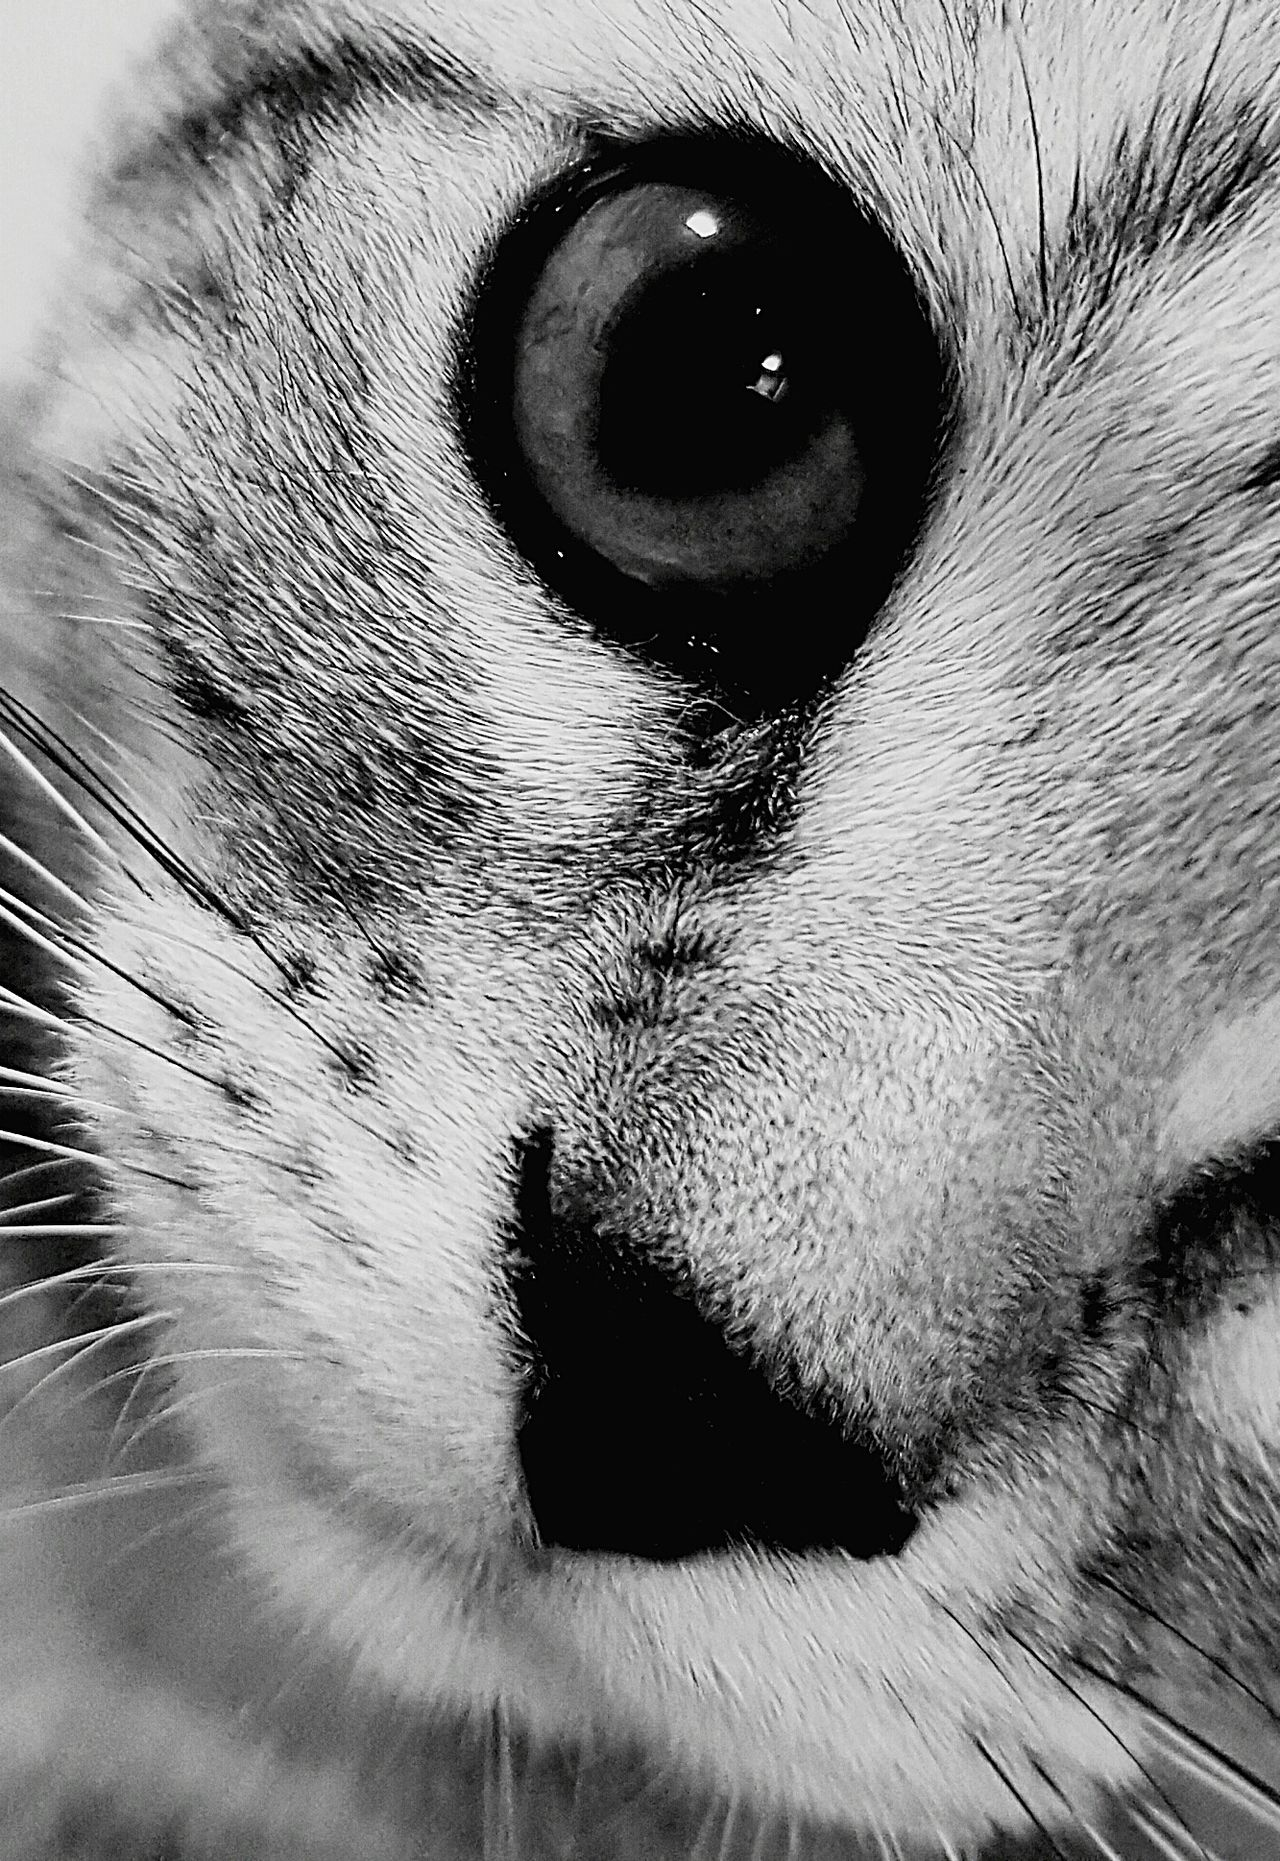 Furryfriend Furry Cat Blackandwhite Eye